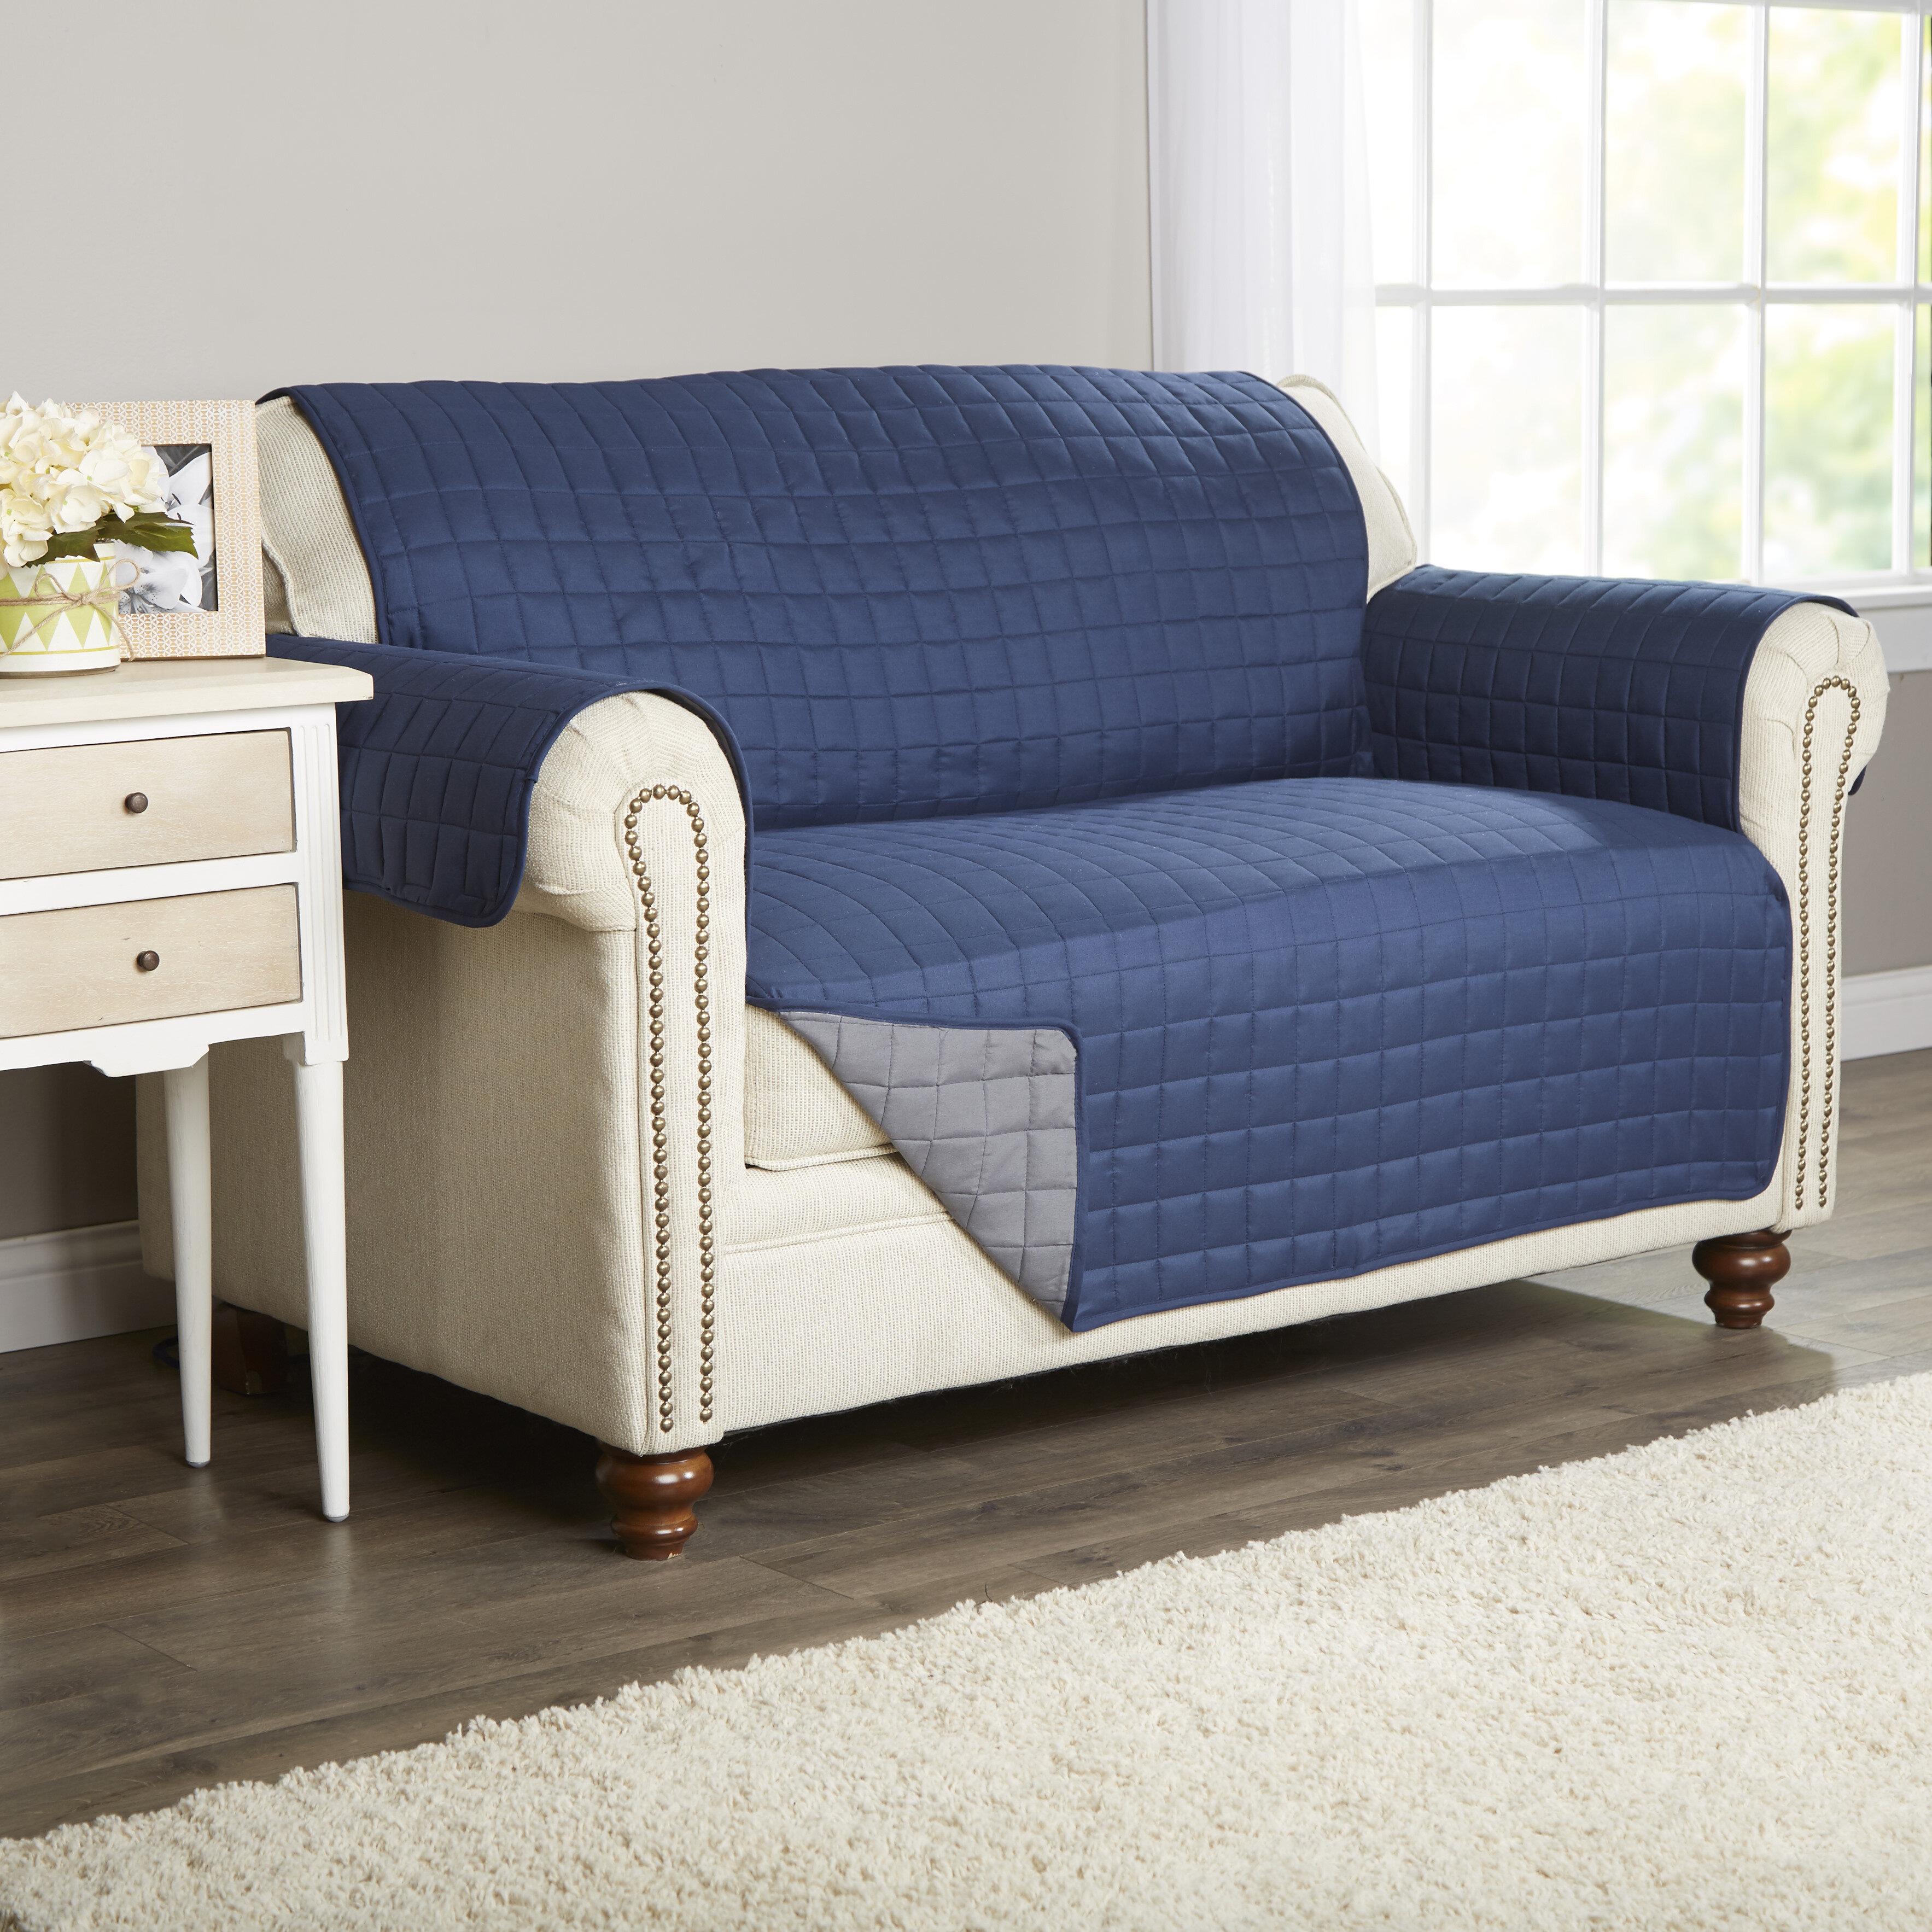 Stupendous Wayfair Basics Box Cushion Loveseat Slipcover Reviews Beatyapartments Chair Design Images Beatyapartmentscom